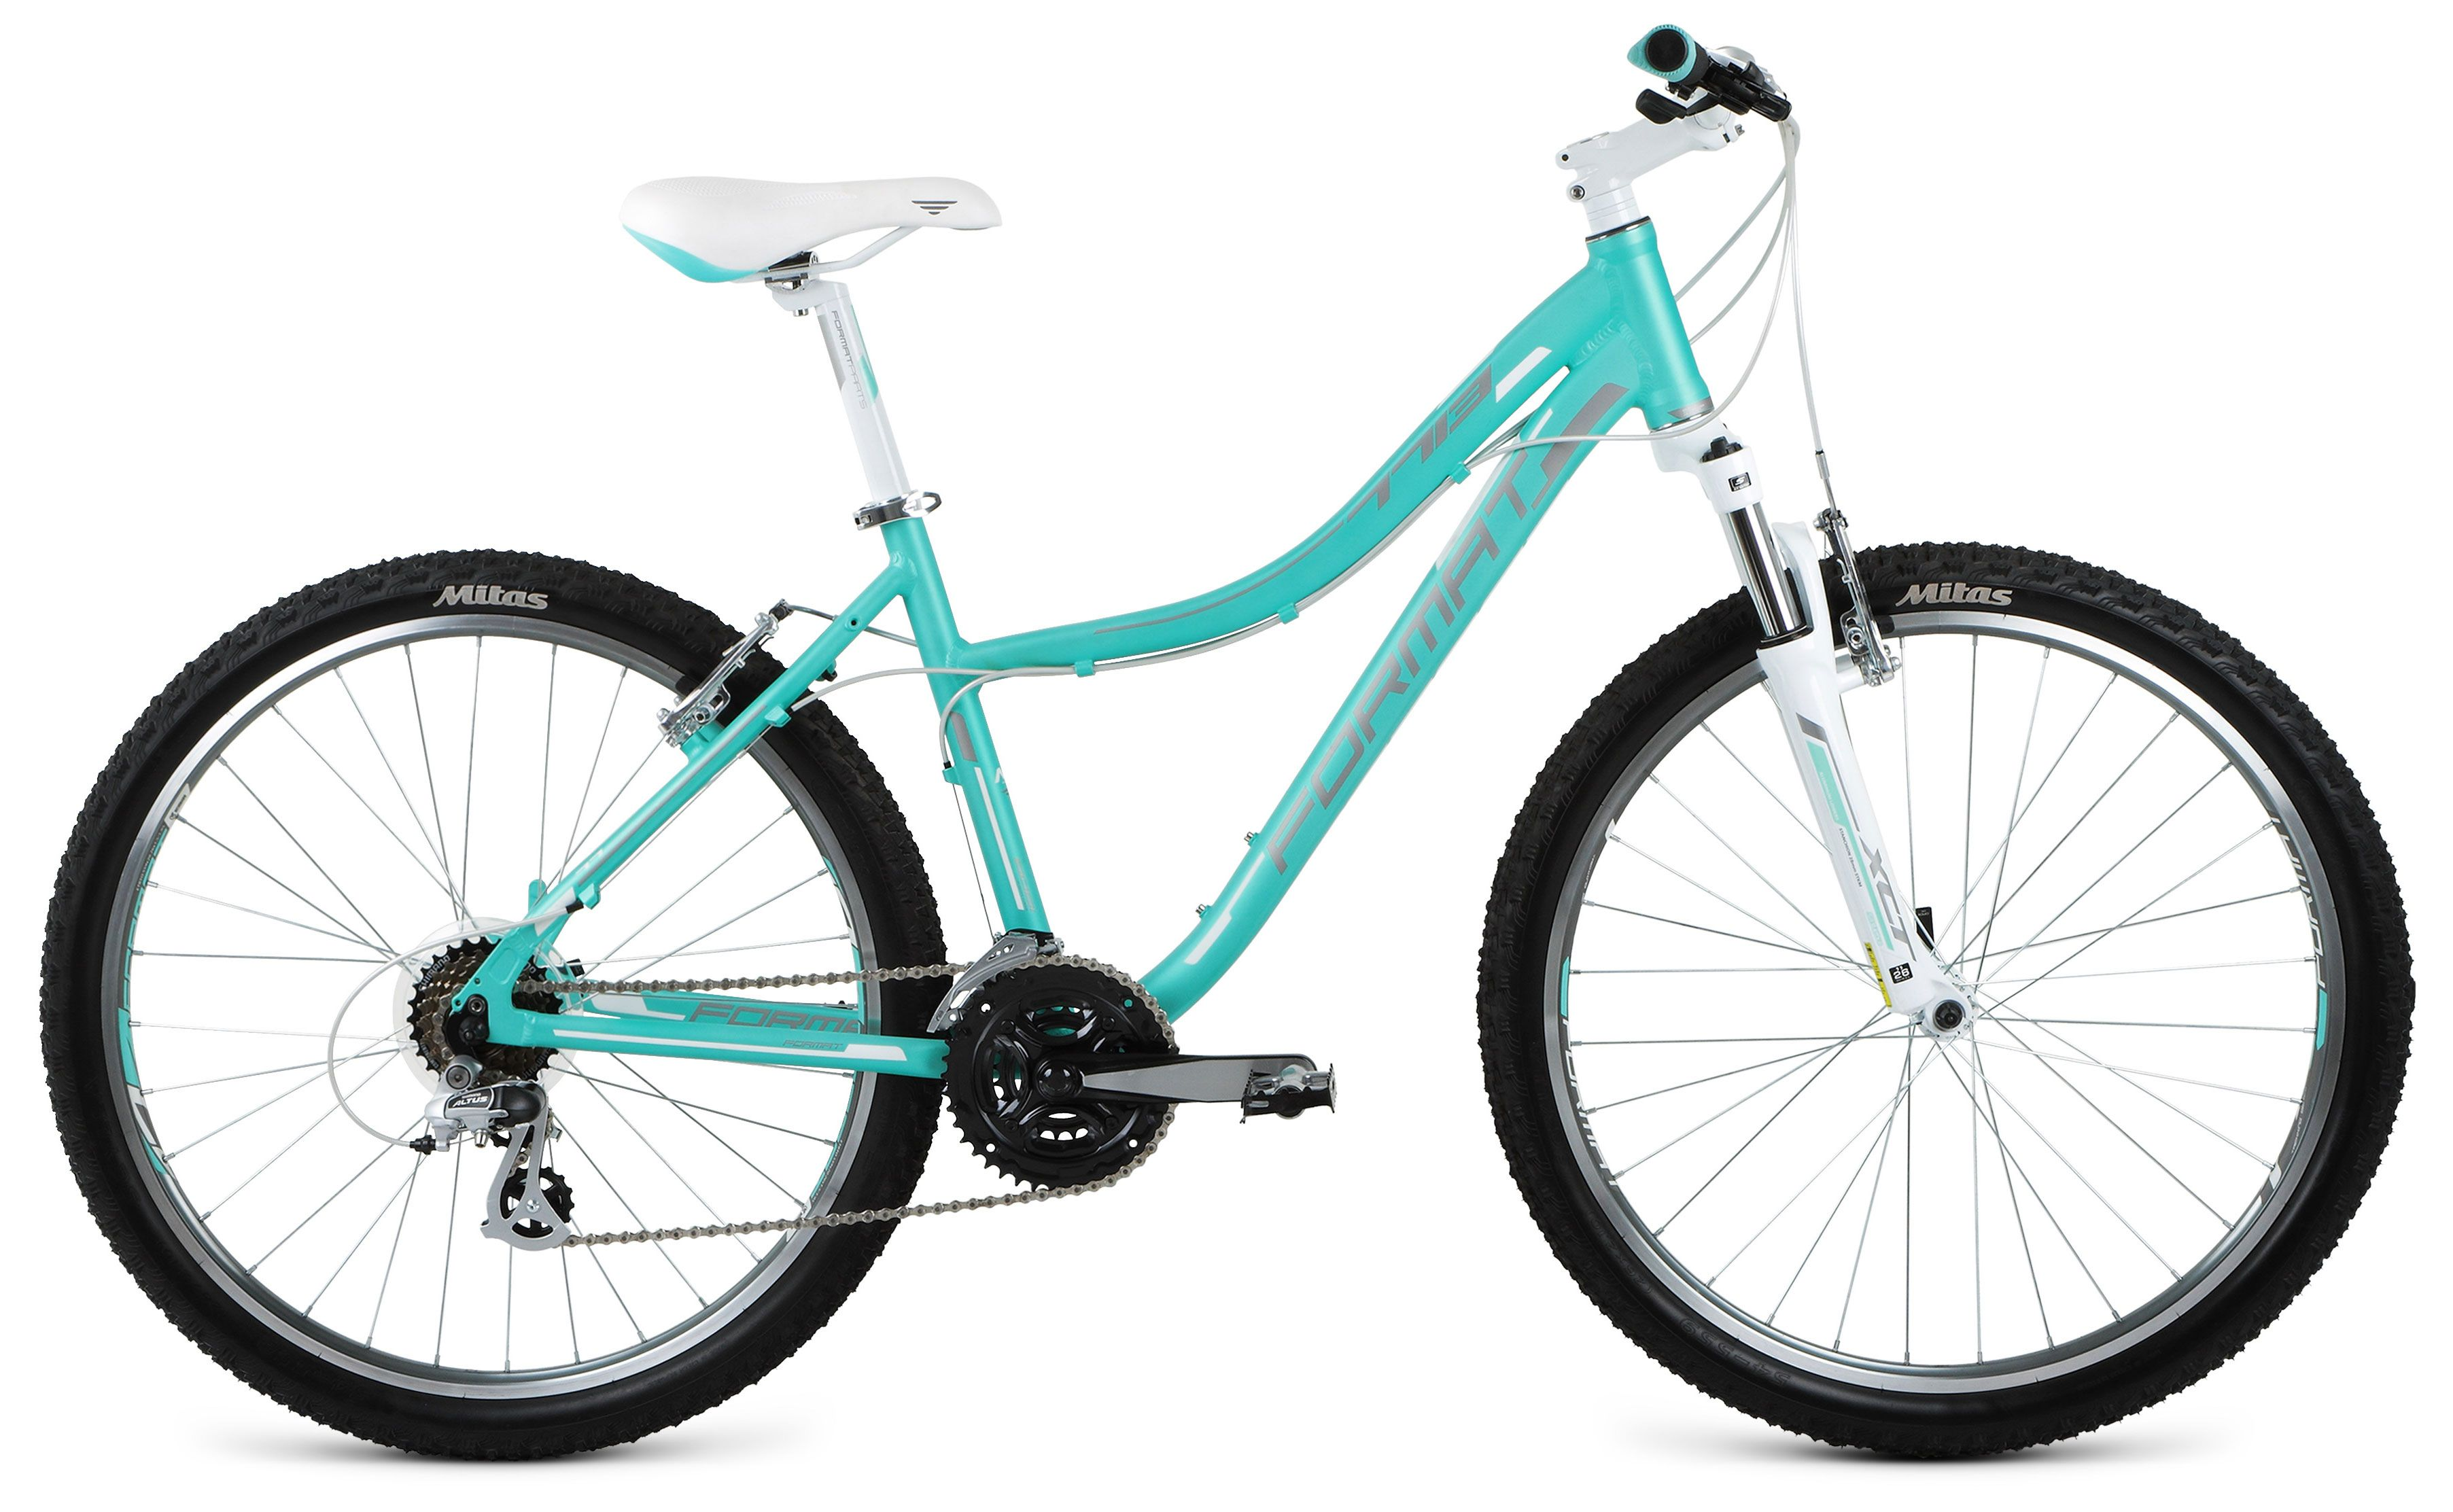 Велосипед Format 7713 2017,  Женские  - артикул:280179